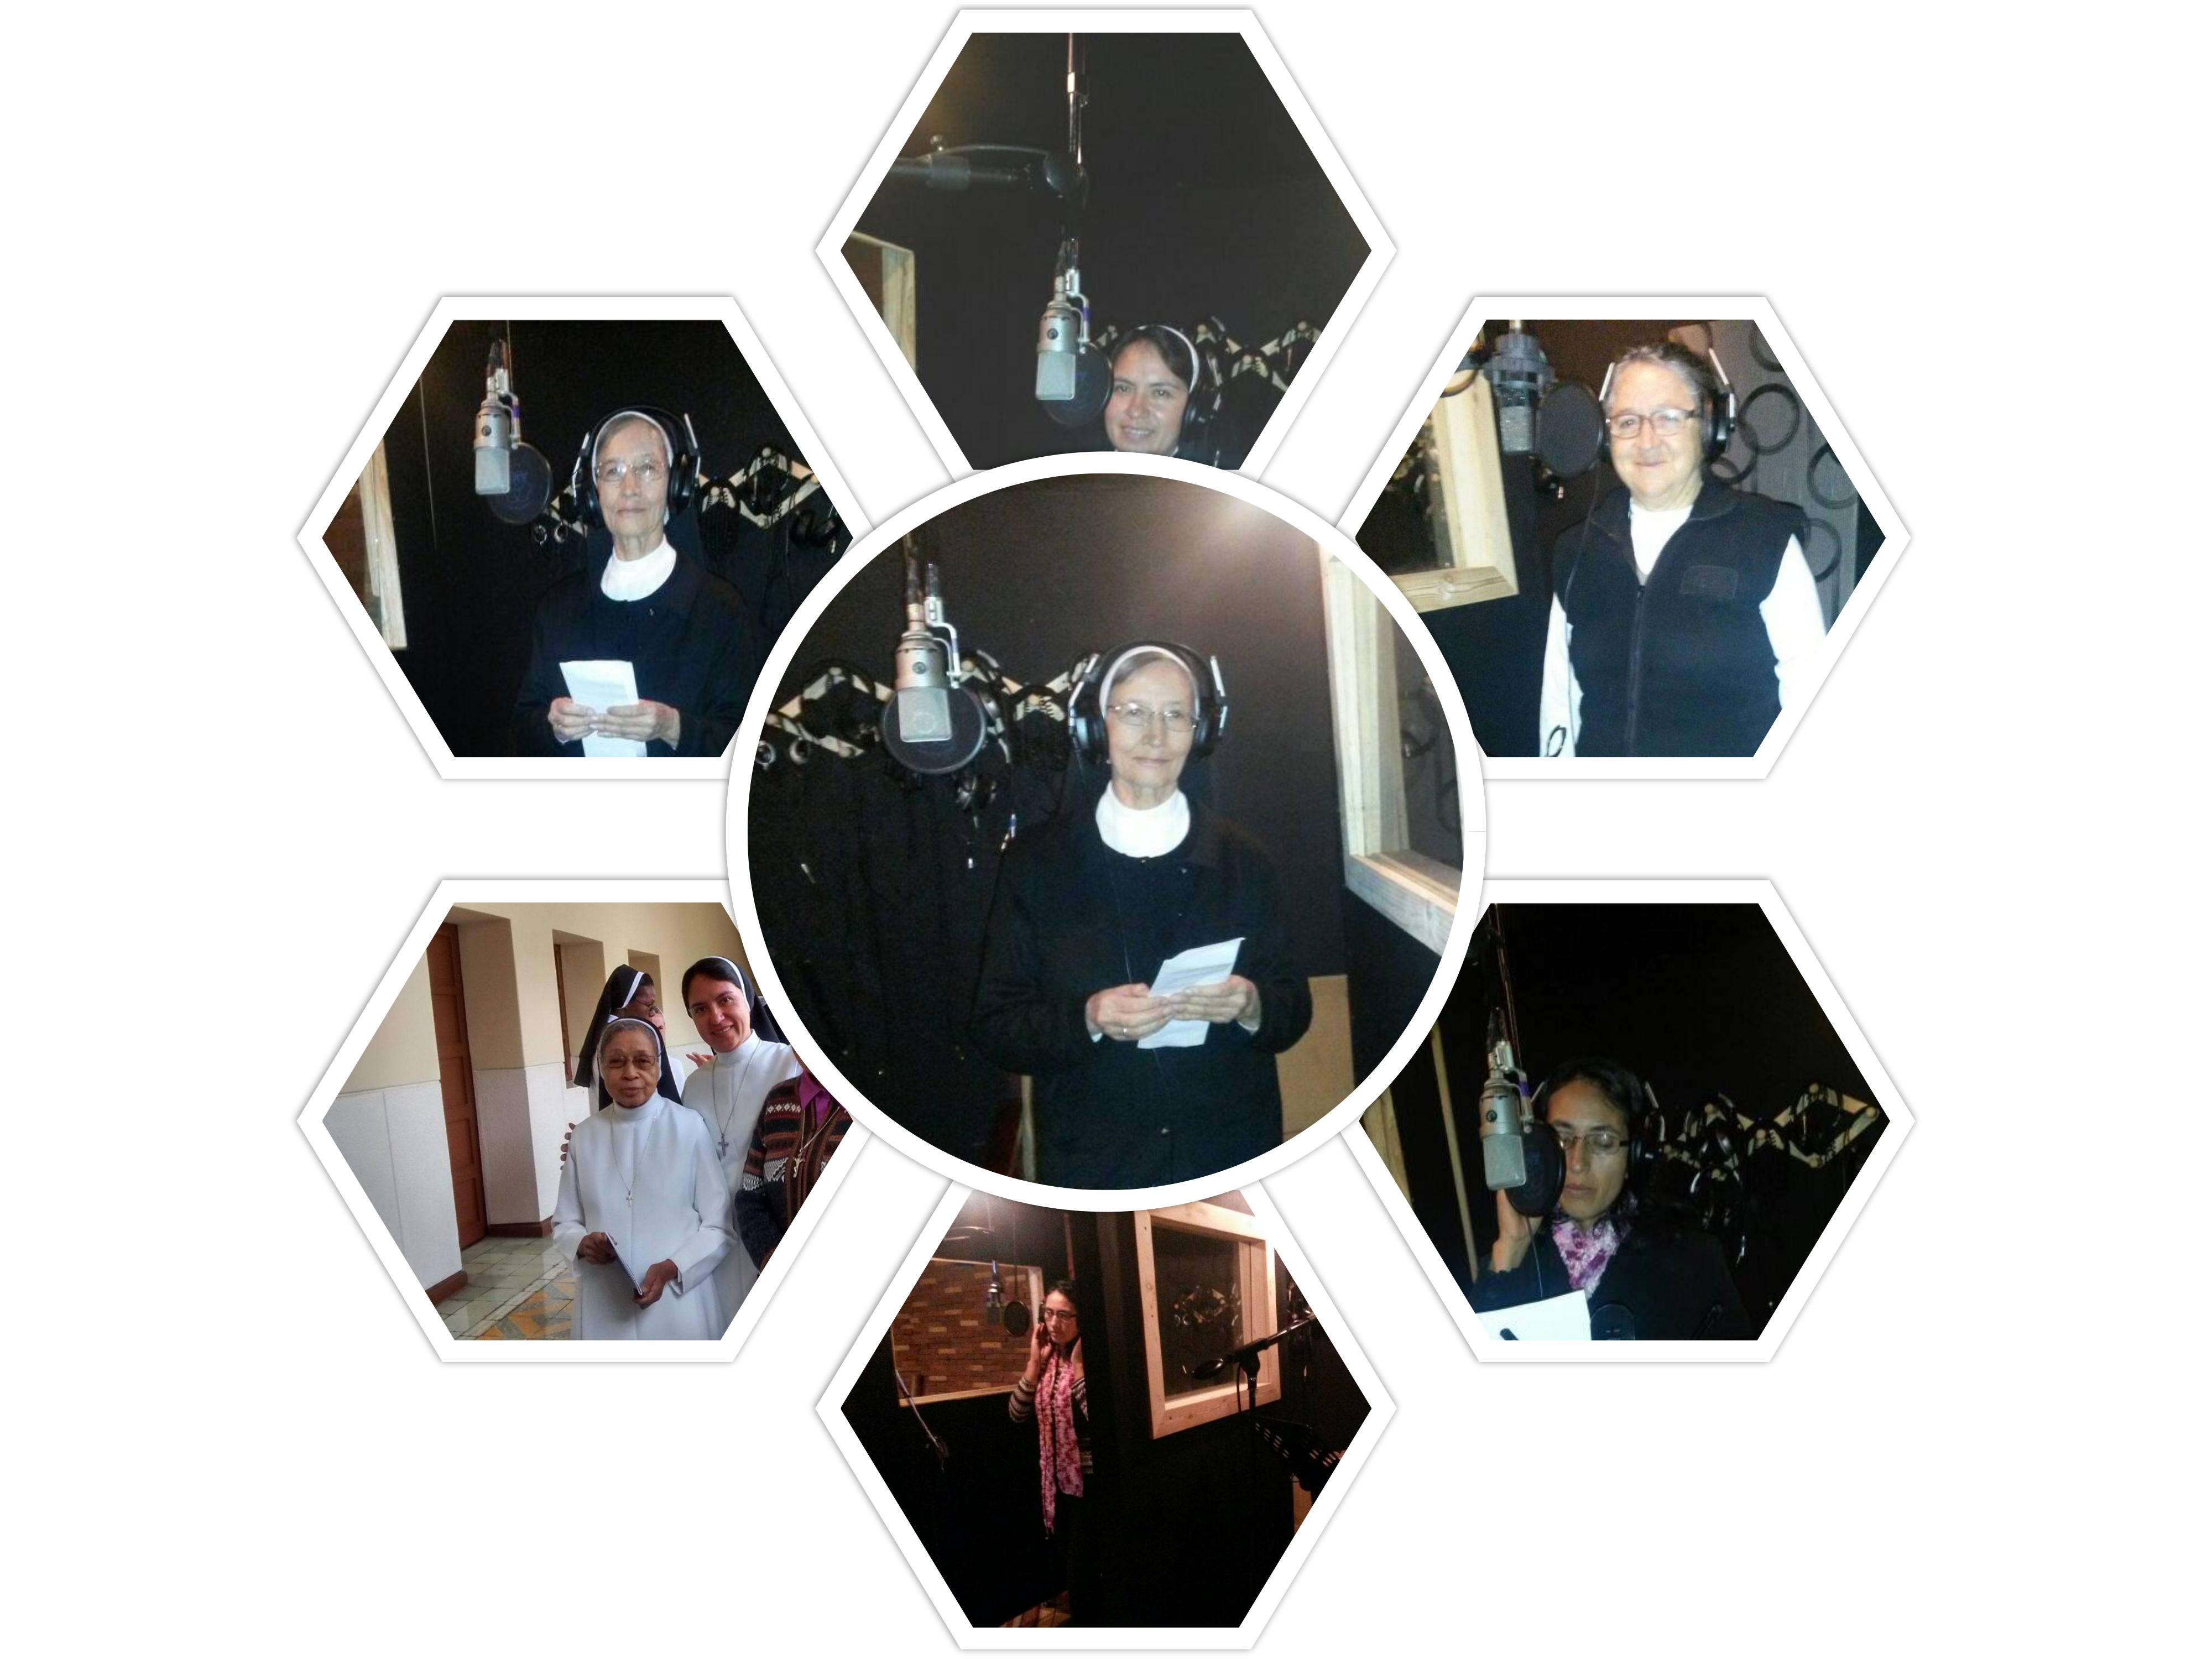 Creadoras del himno jubilar DIC